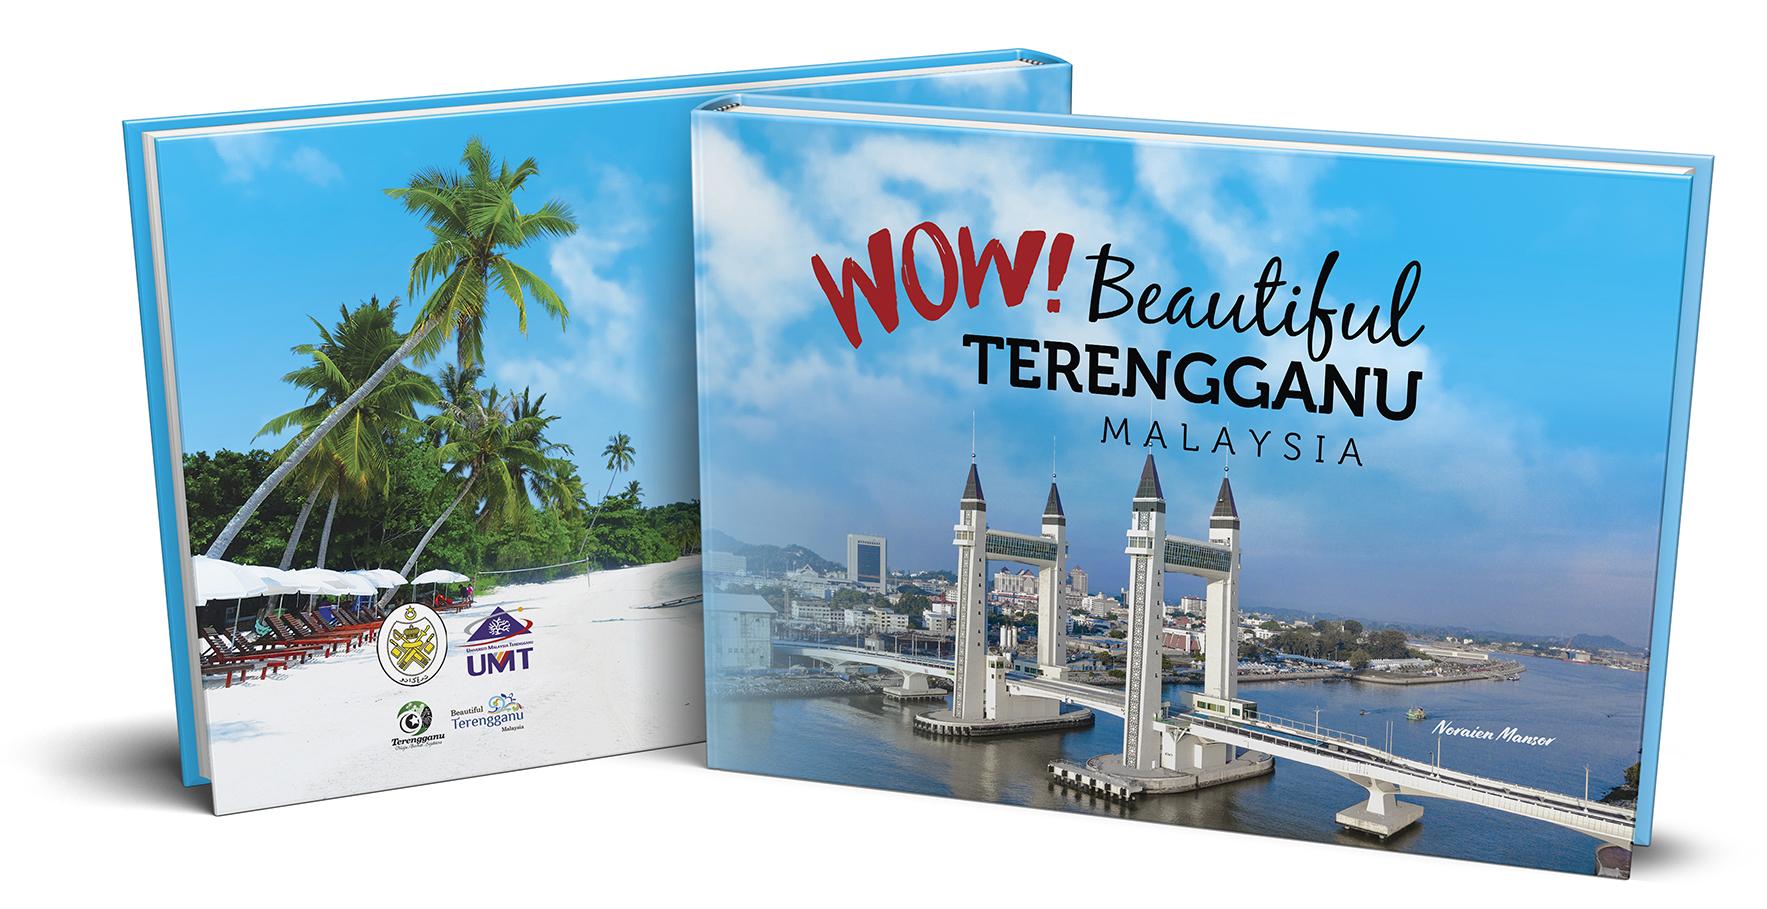 Wow! Beautiful Terengganu Malaysia